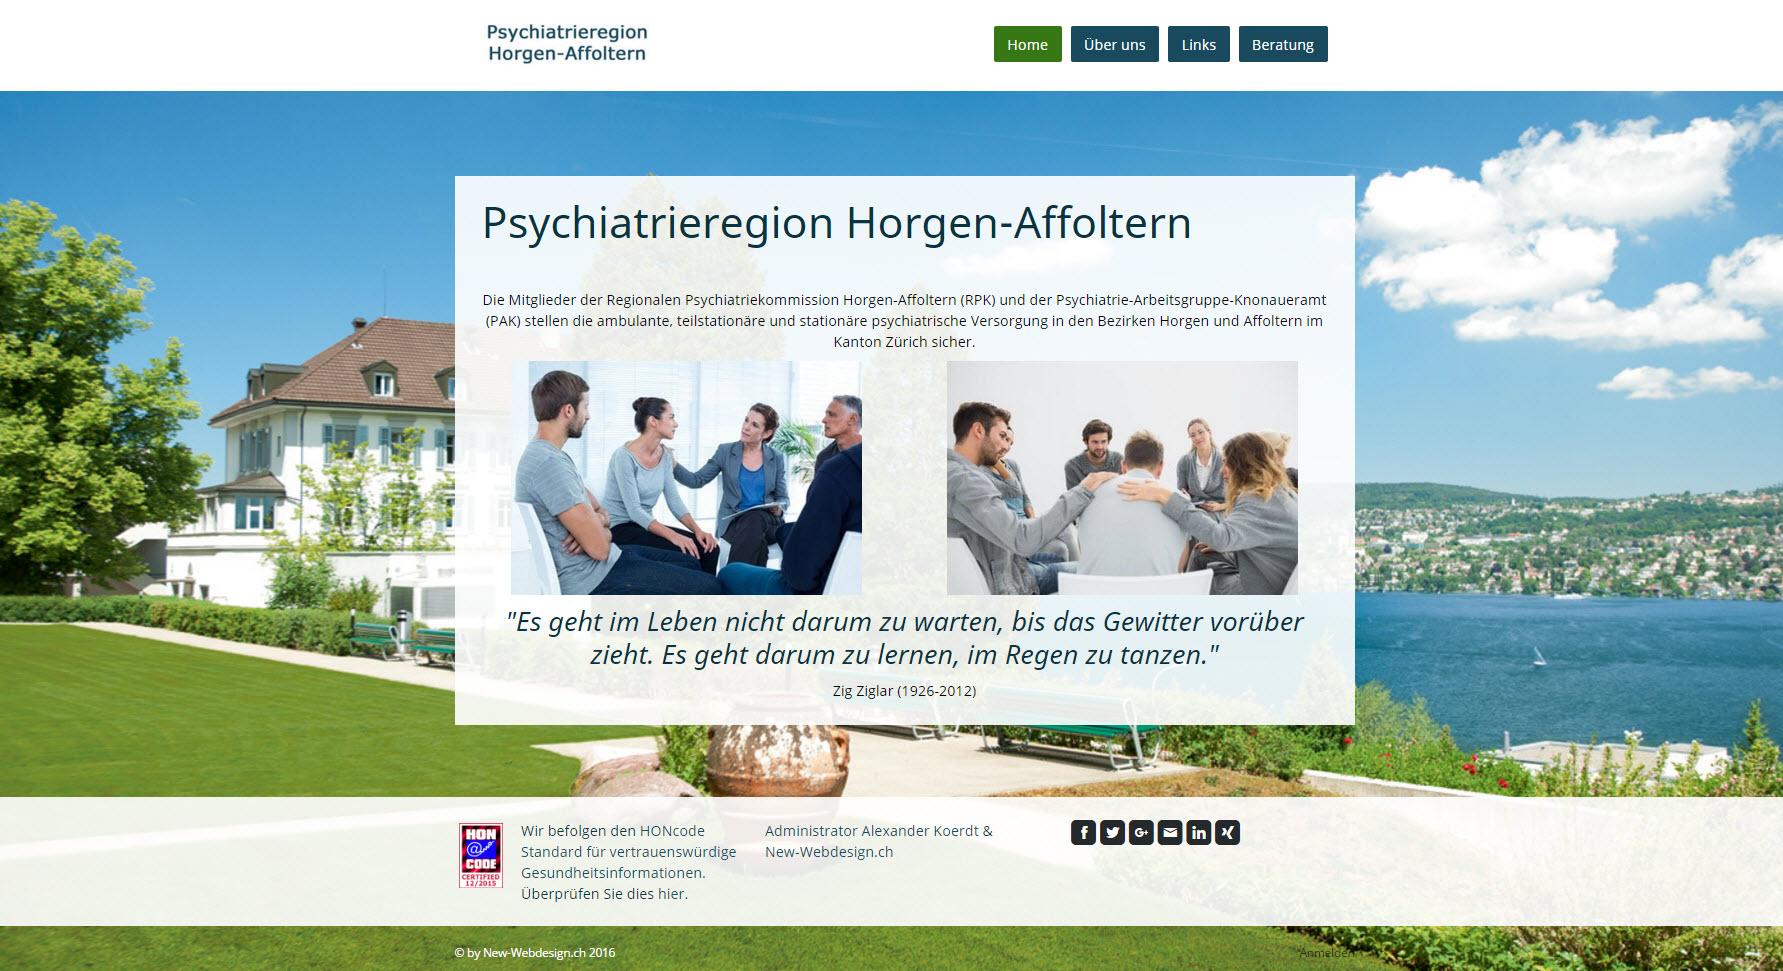 www.psychiatrie-horgen-affoltern.ch